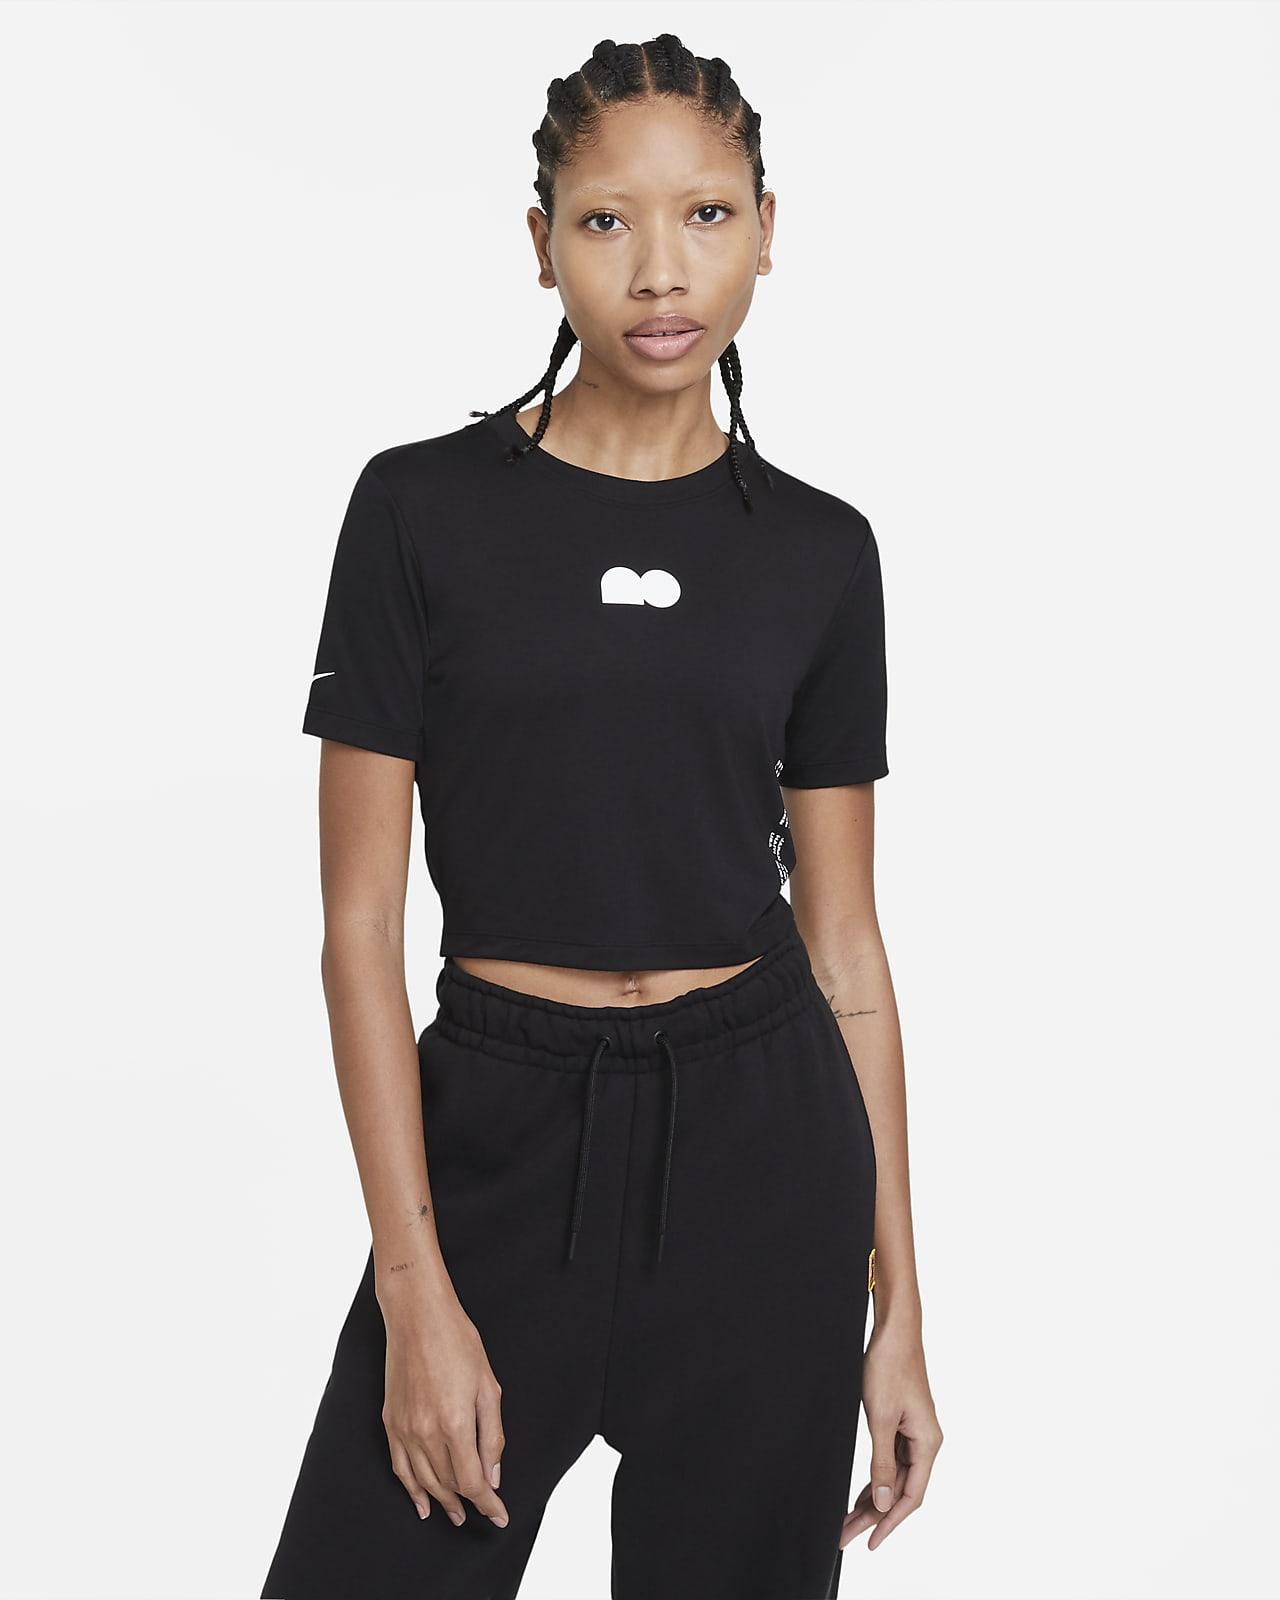 T-Shirt τένις με κοντό μήκος Naomi Osaka